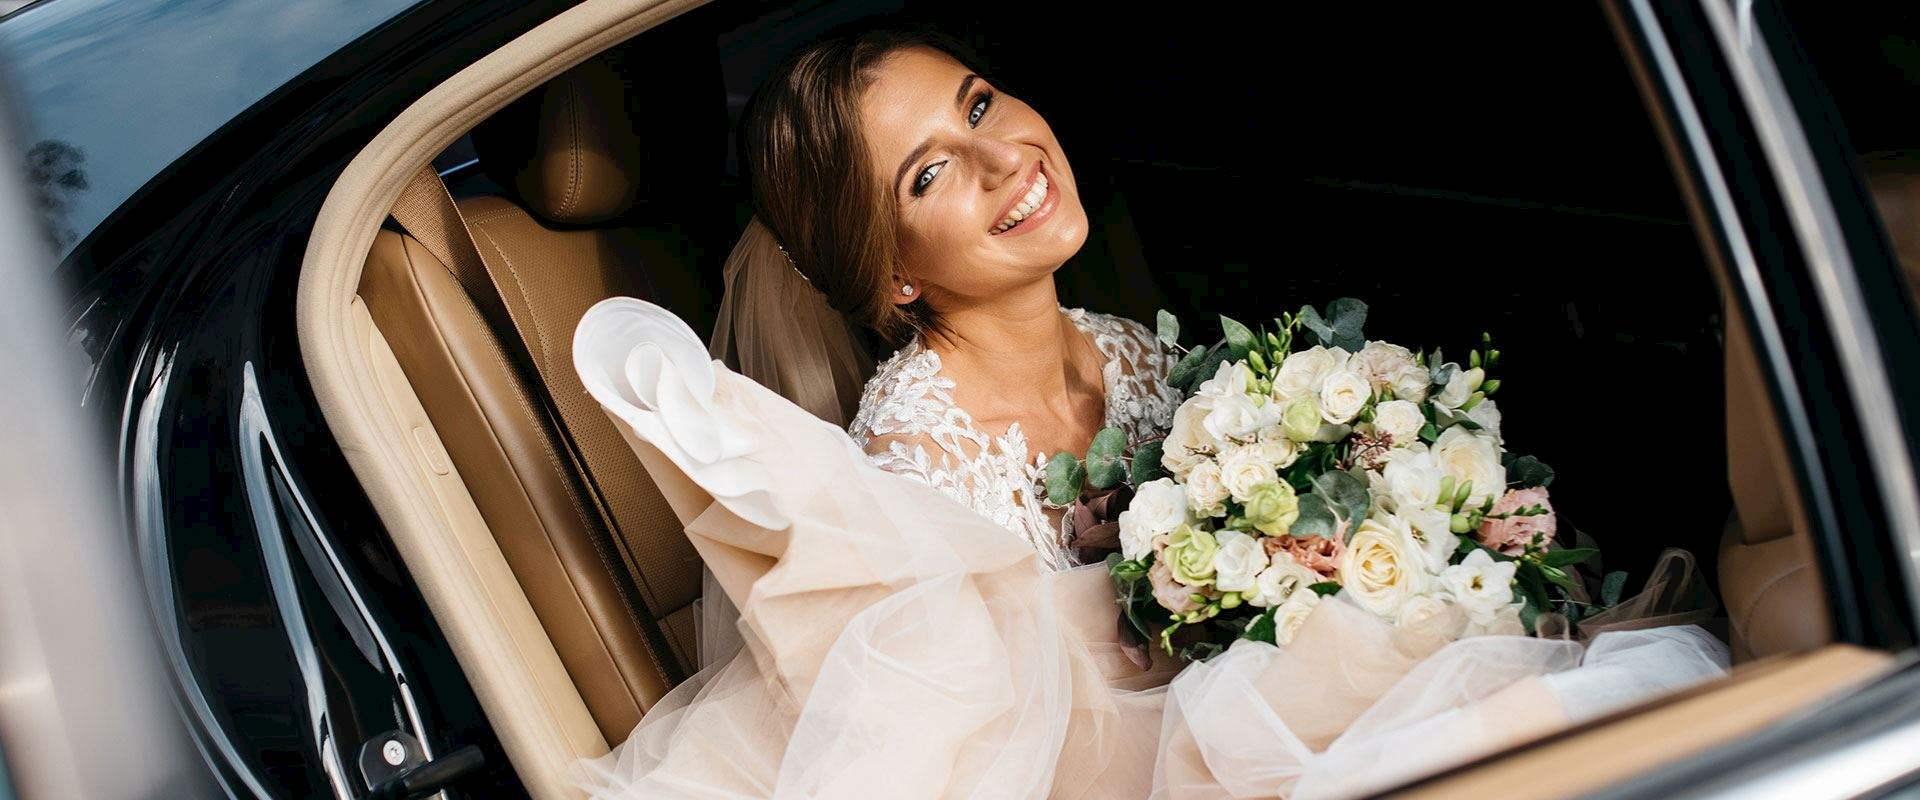 Wedding Facilities in Daytona Beach Hotel